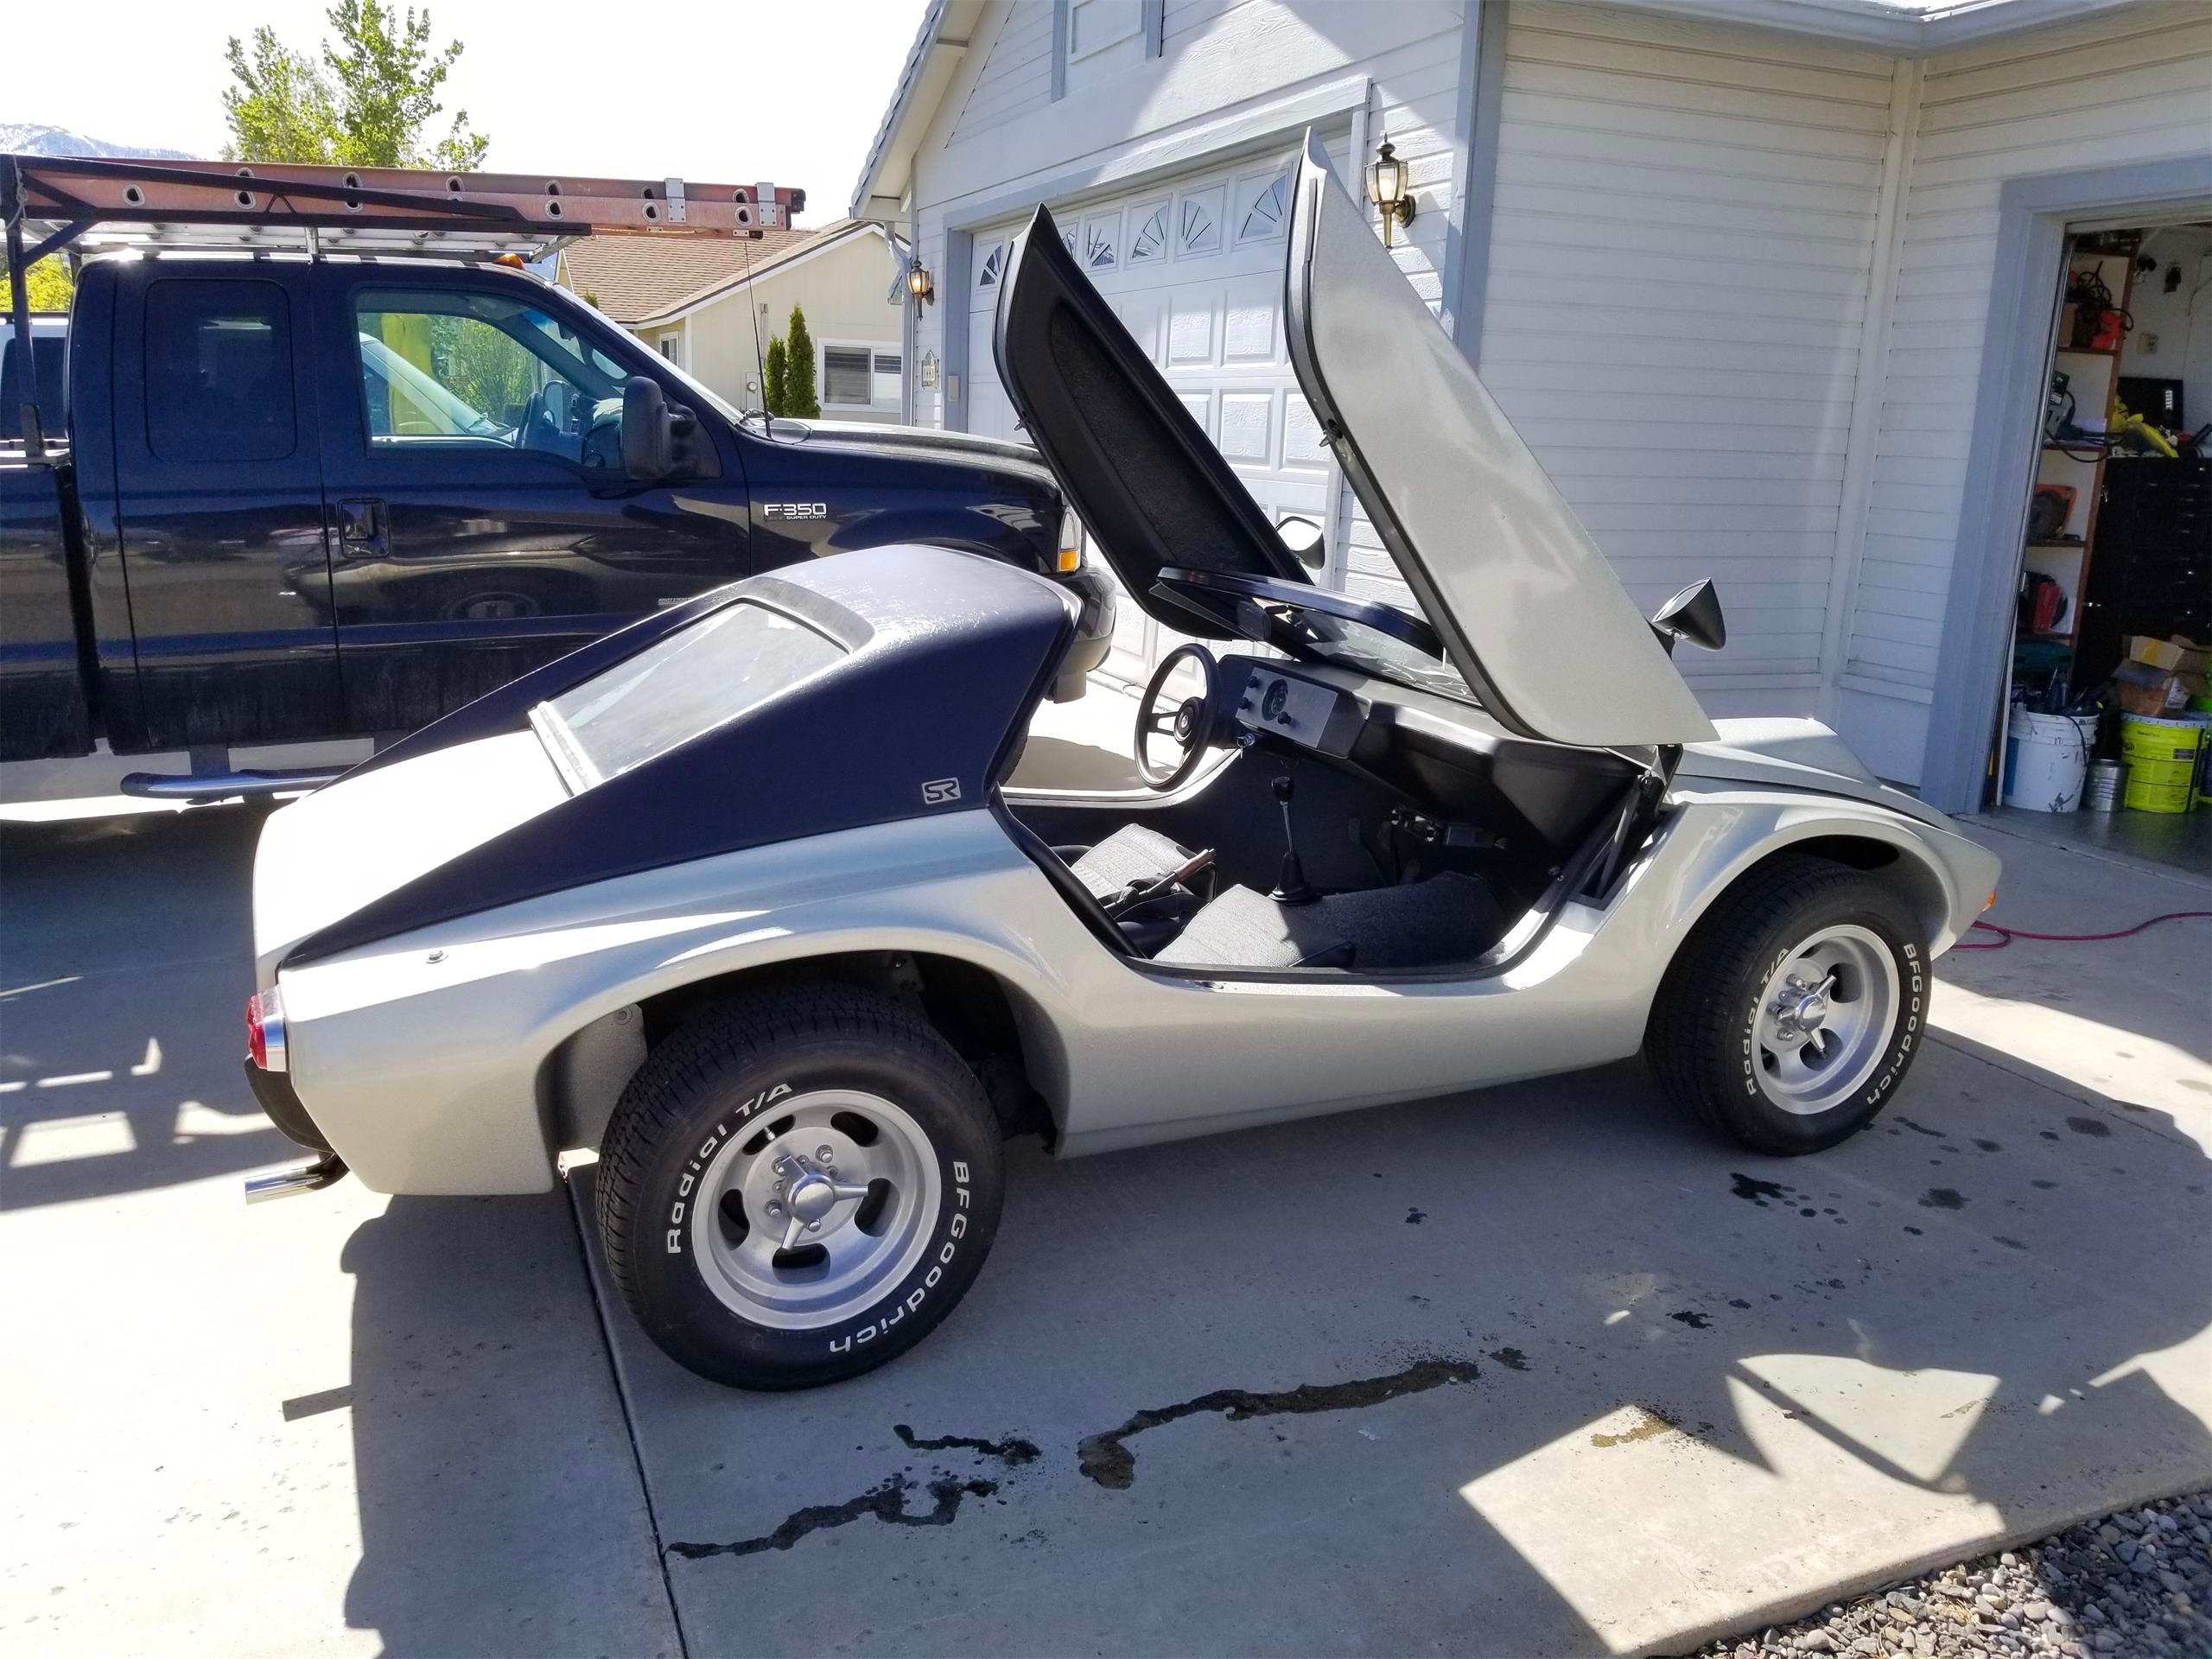 Meyers Manx, Meyers Manx SR2 has Targa-style roof, scissor doors, ClassicCars.com Journal